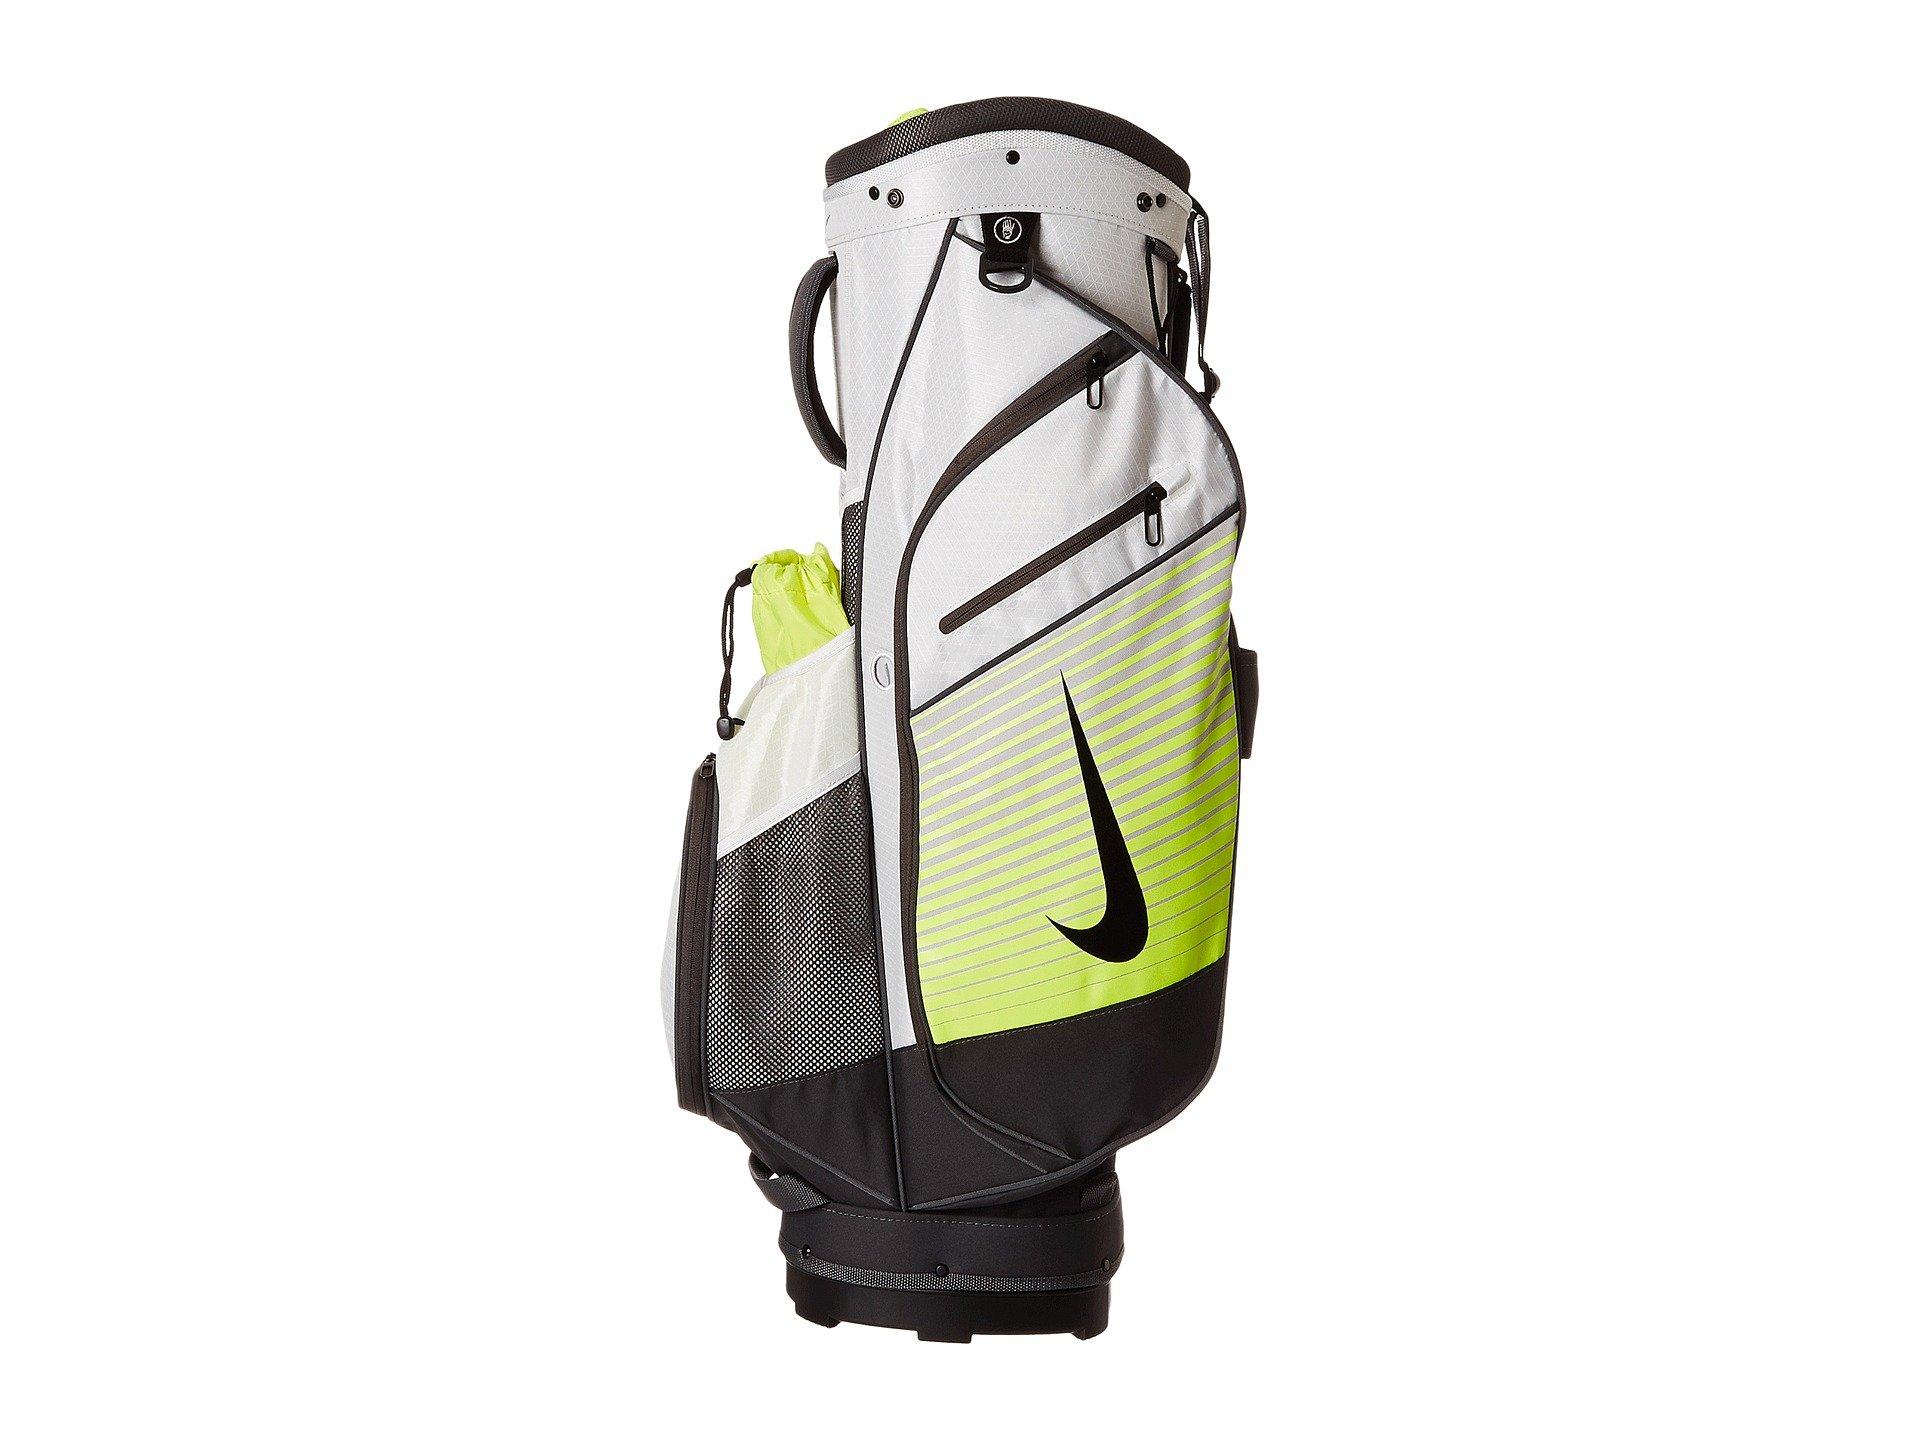 1d19b5afe34d Lyst - Nike Sport Cart Iii Cart Bag in White